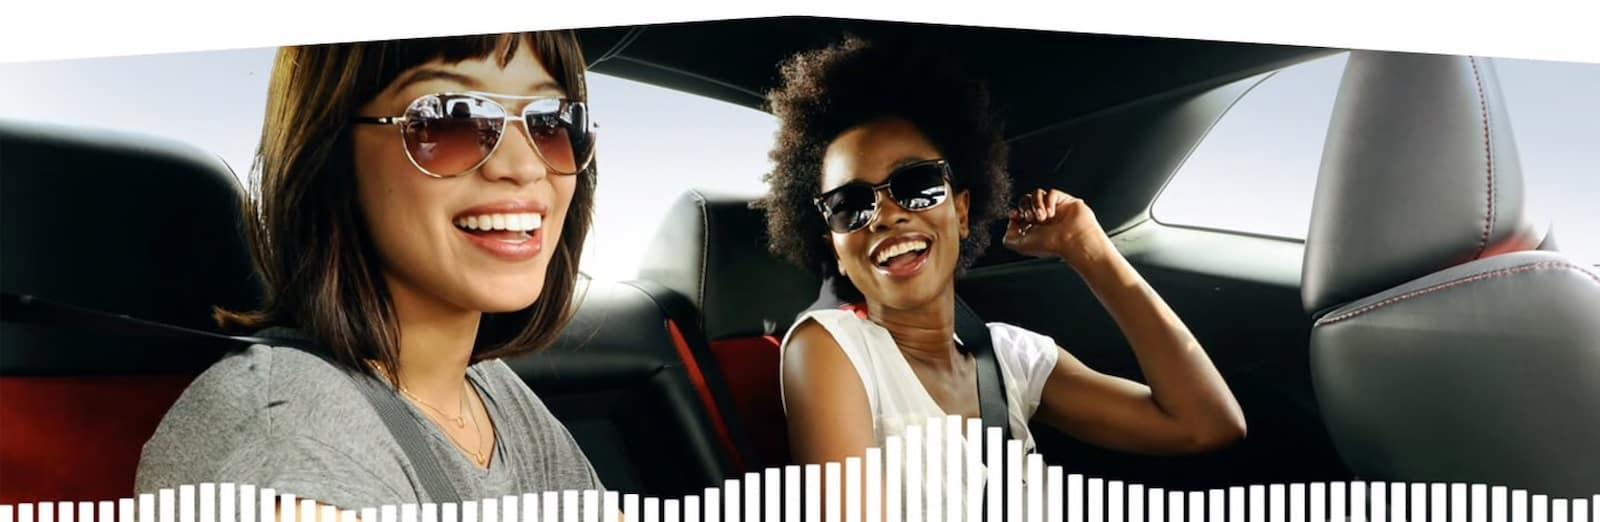 2021 Dodge Challenger Alpine and Harman Kardon Premium Audio Systems